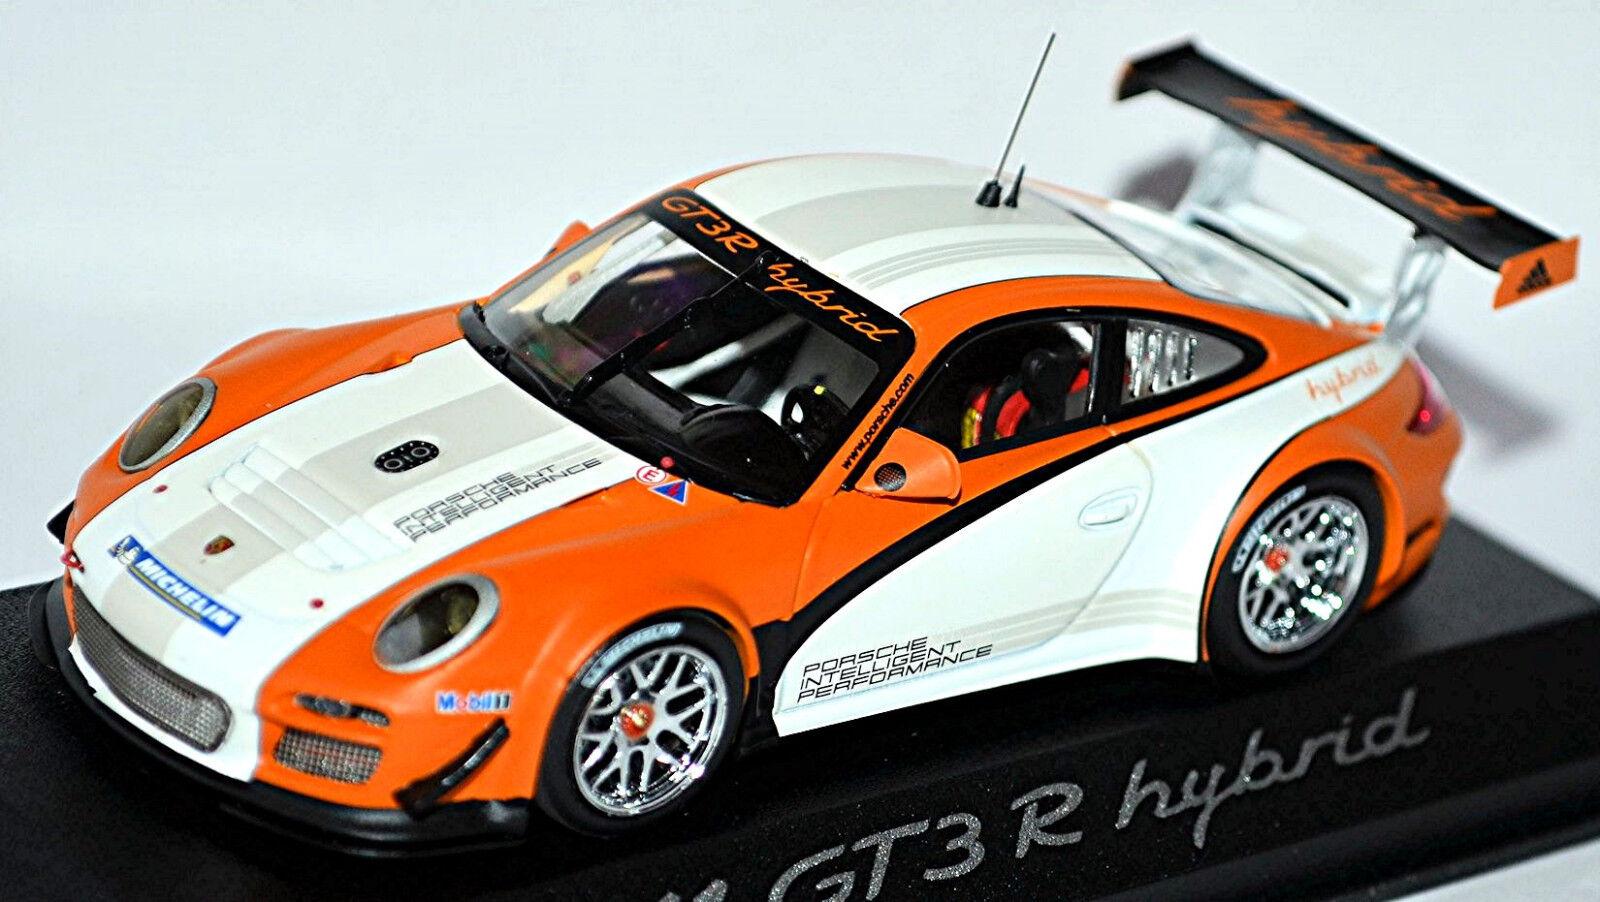 Porsche 911 GT3 R Híbrido Tipo  997 II 2010 blancoo blancoo 1 43 Minichamps